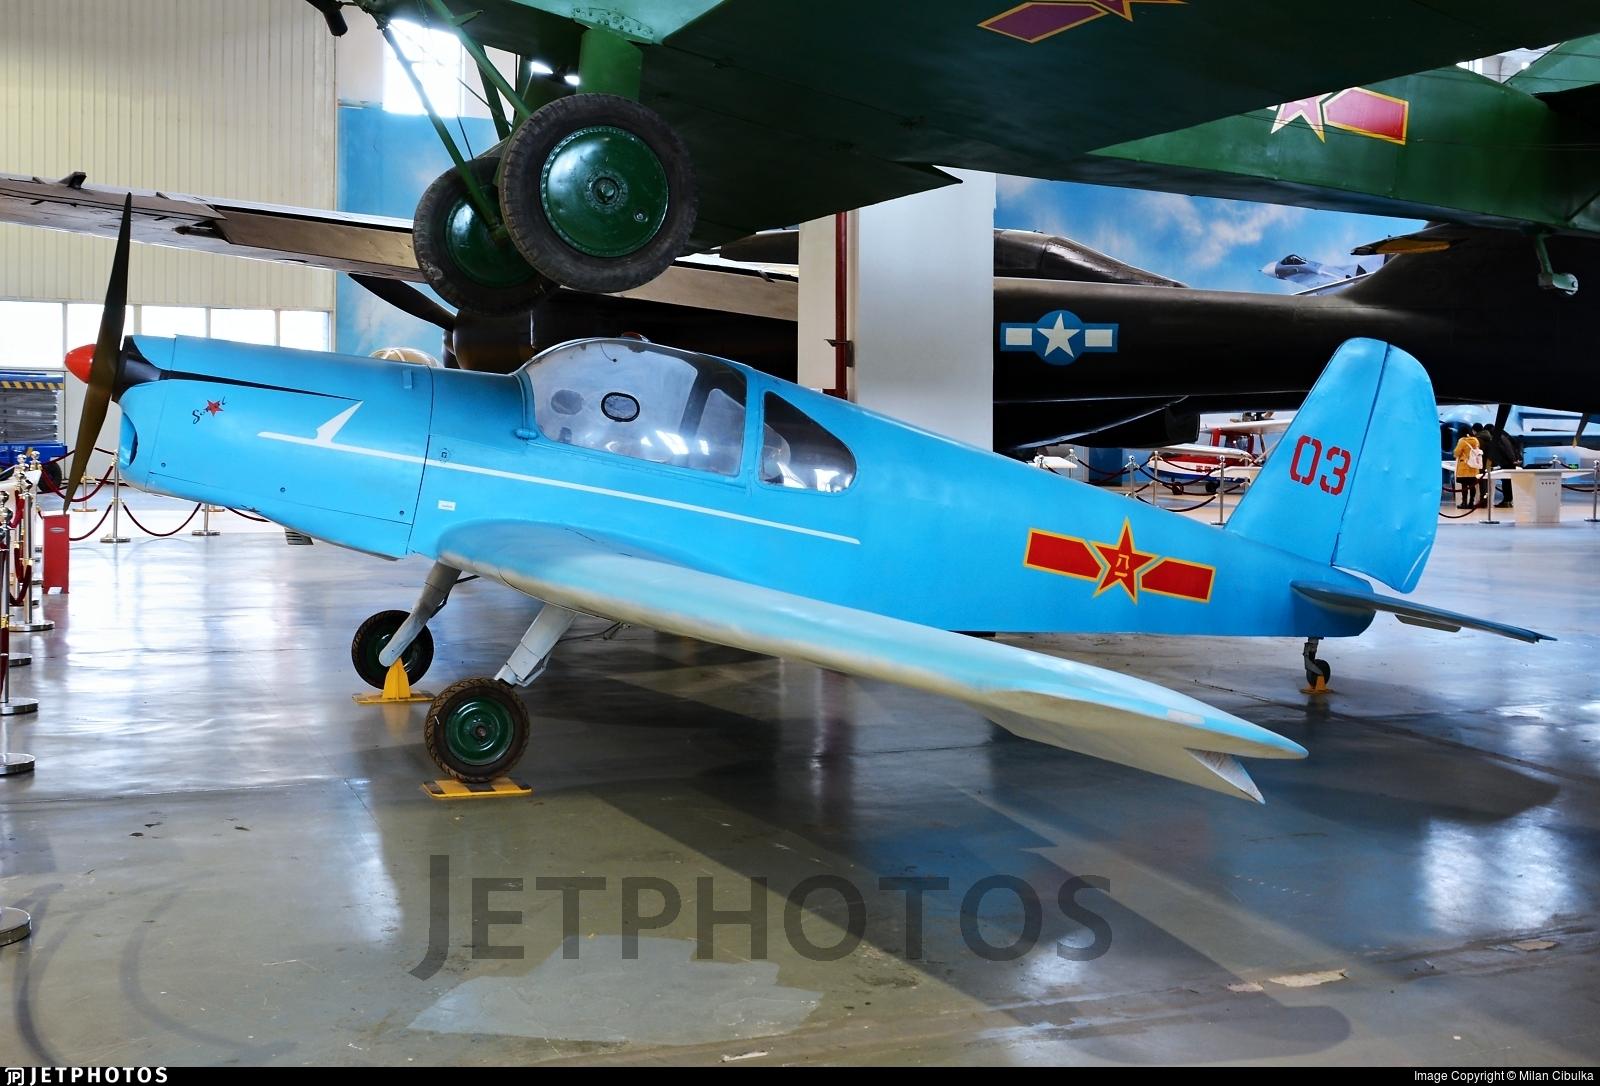 03 - Benes-Mraz M.1C Sokol - China - Air Force